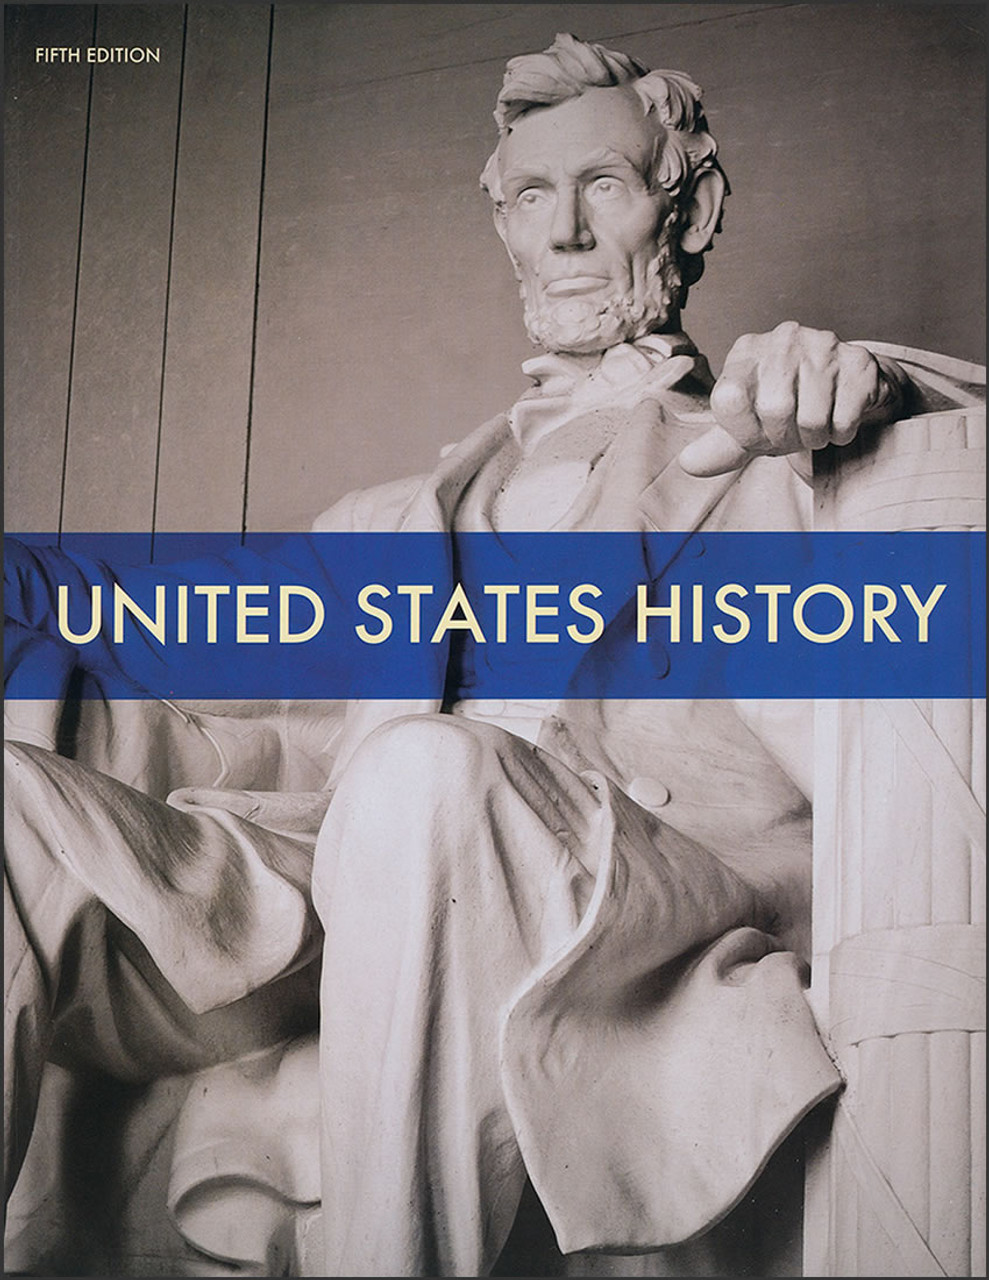 United States History, 5th edition (half)